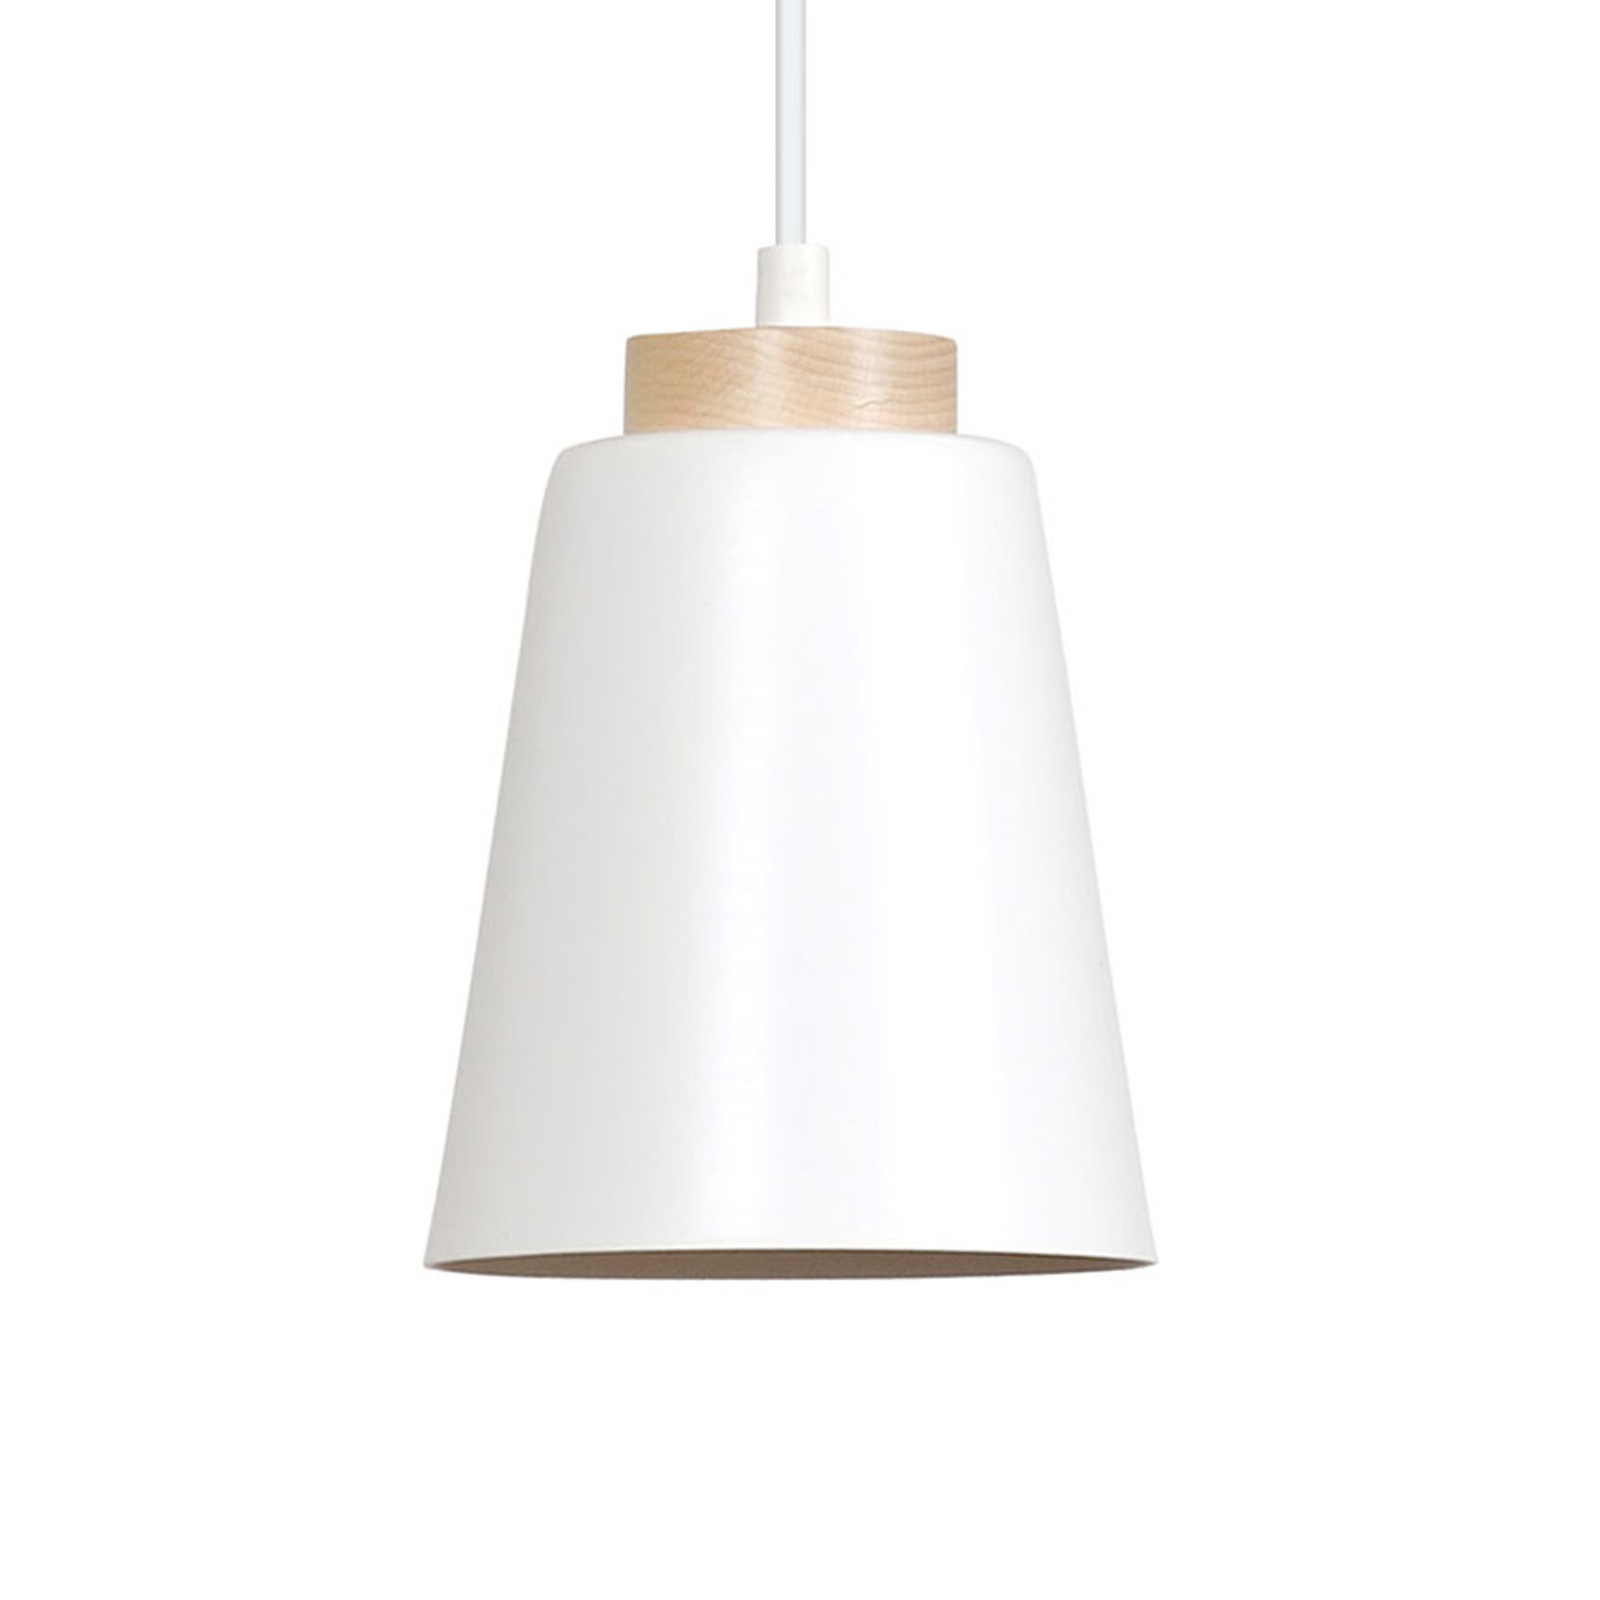 Bolero 1 hængelampe, 1 lyskilde, hvid